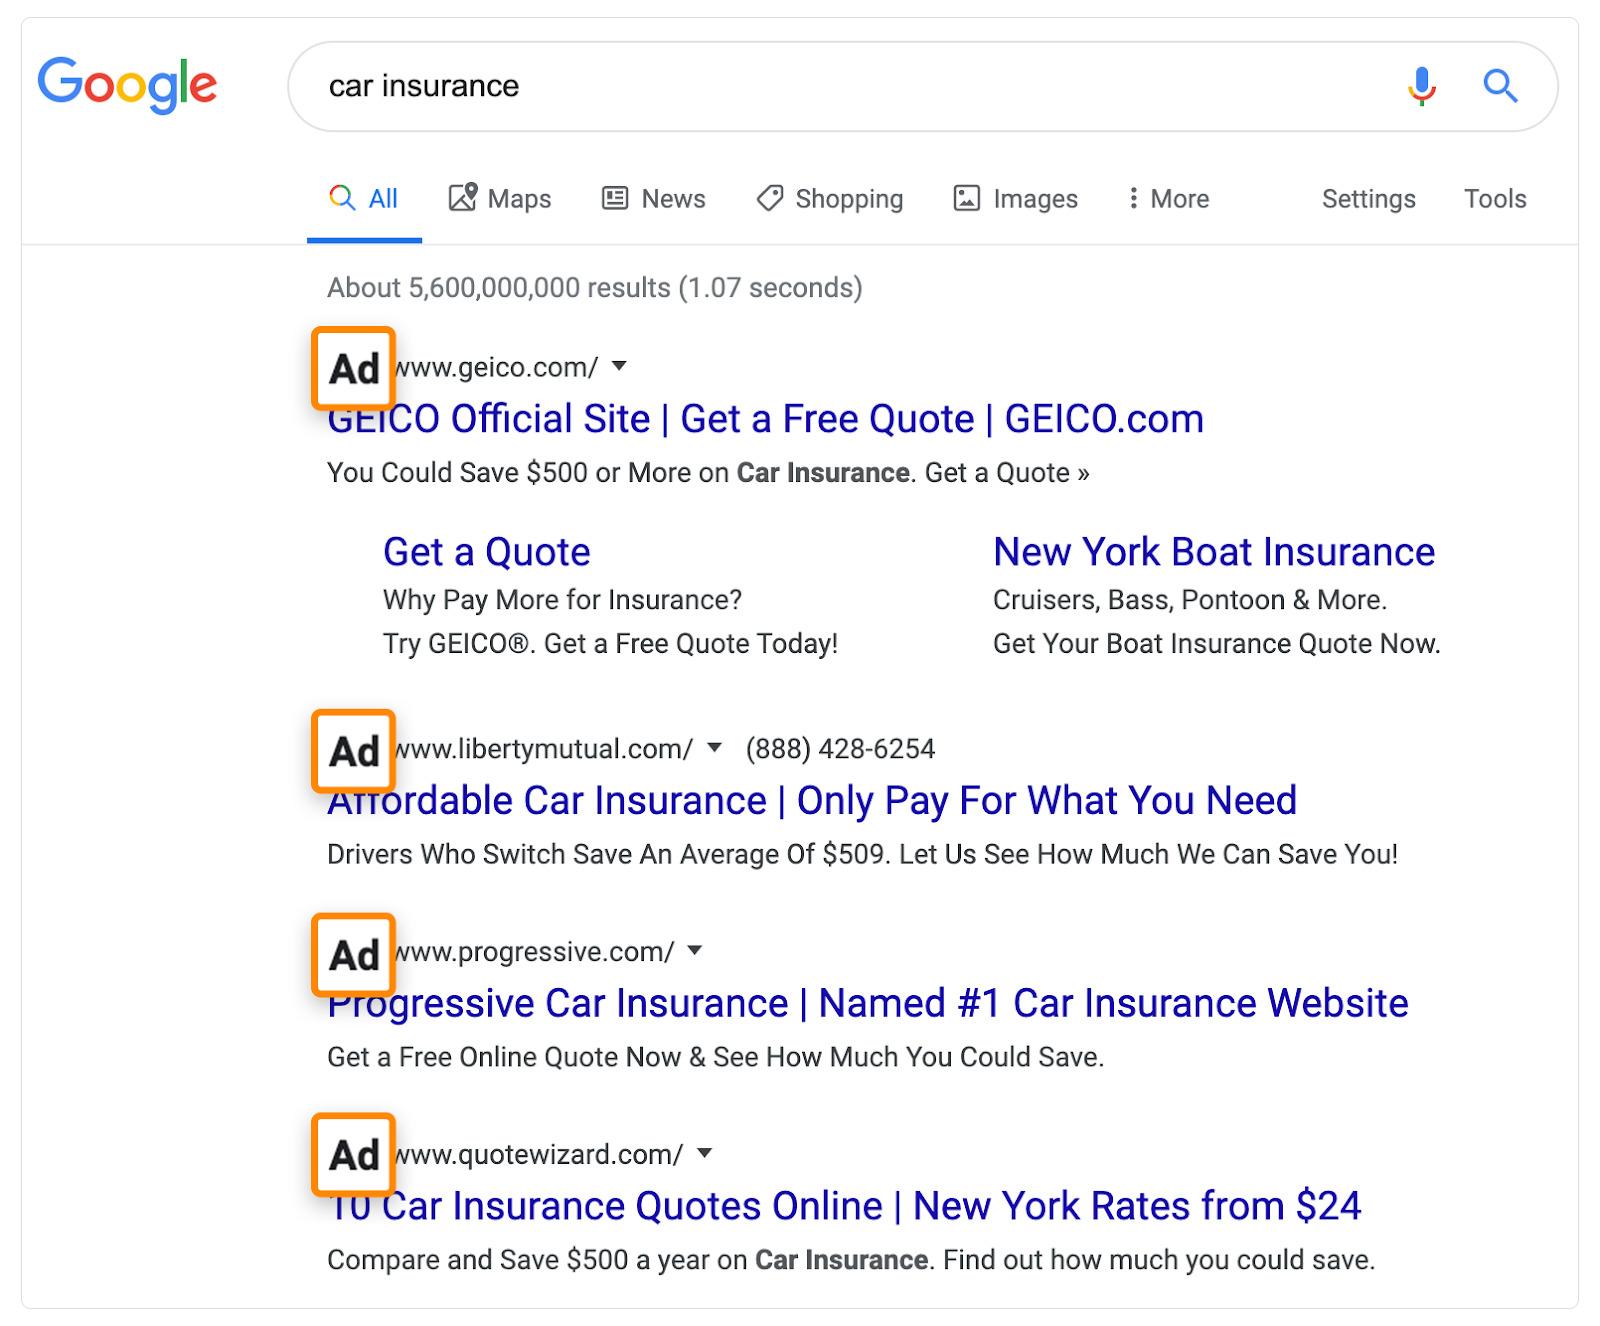 5 car insurance ads